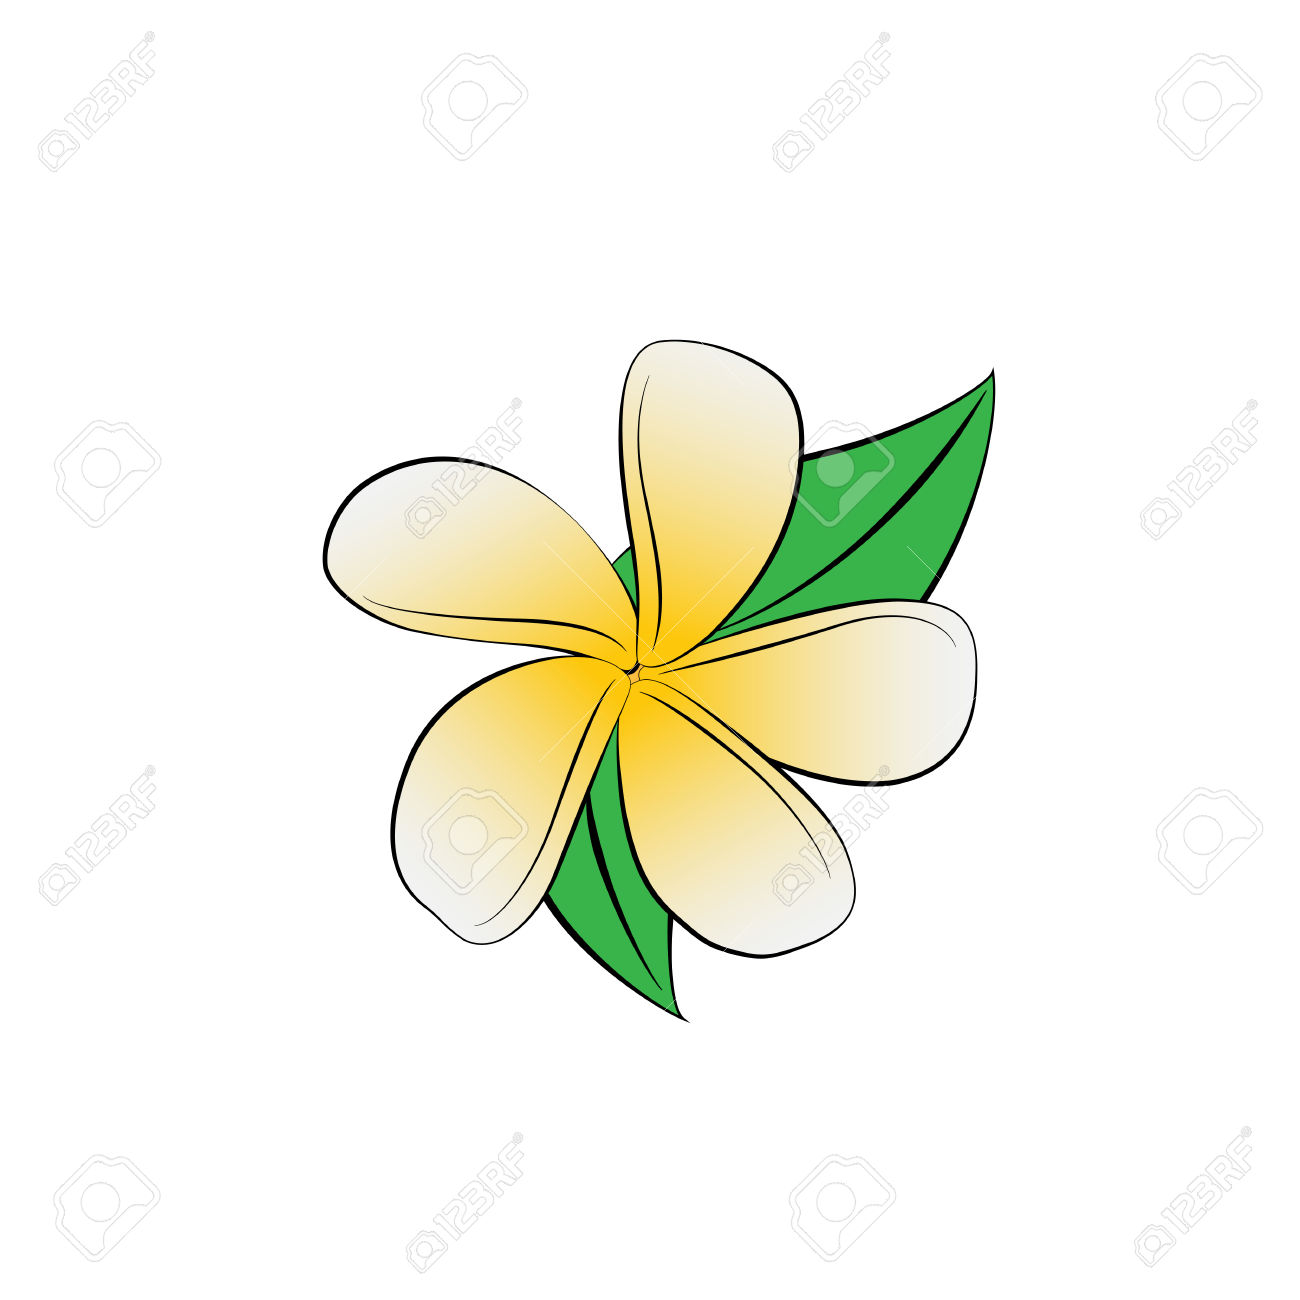 Vector Cartoon Frangipani Flower On White Background. Royalty Free.